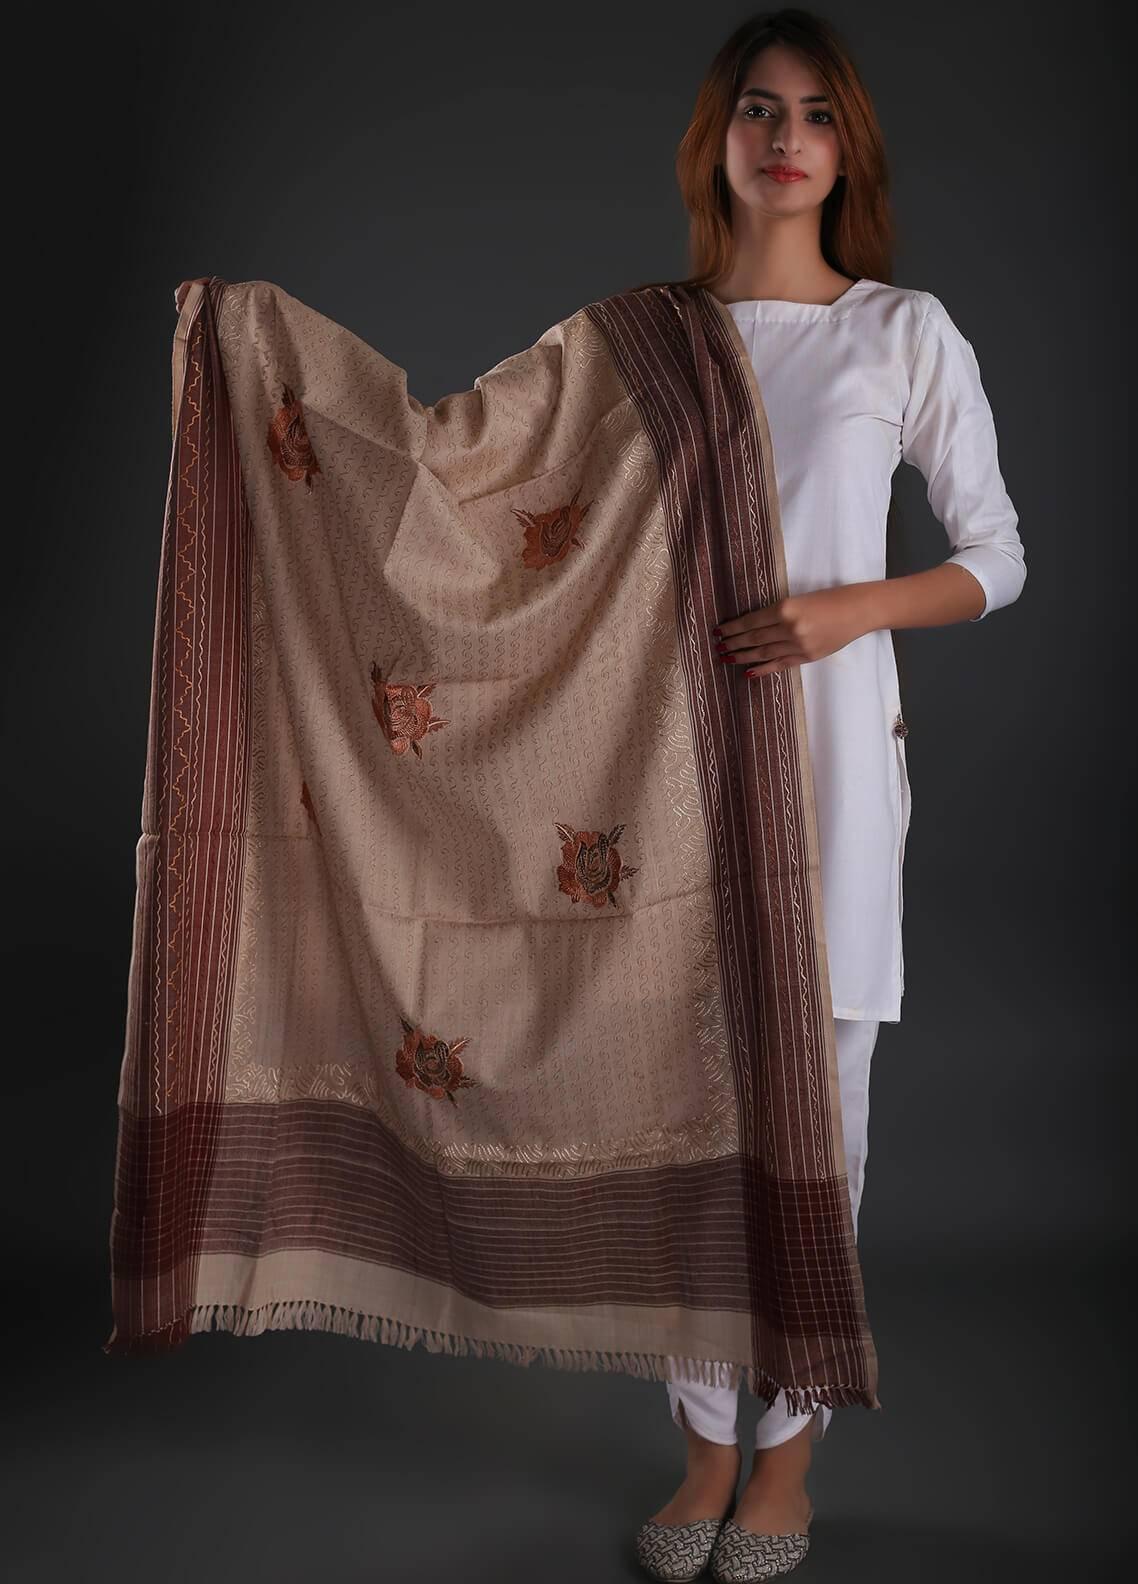 Sanaulla Exclusive Range Embroidered Pashmina  Shawl 121 - Kashmiri Shawls